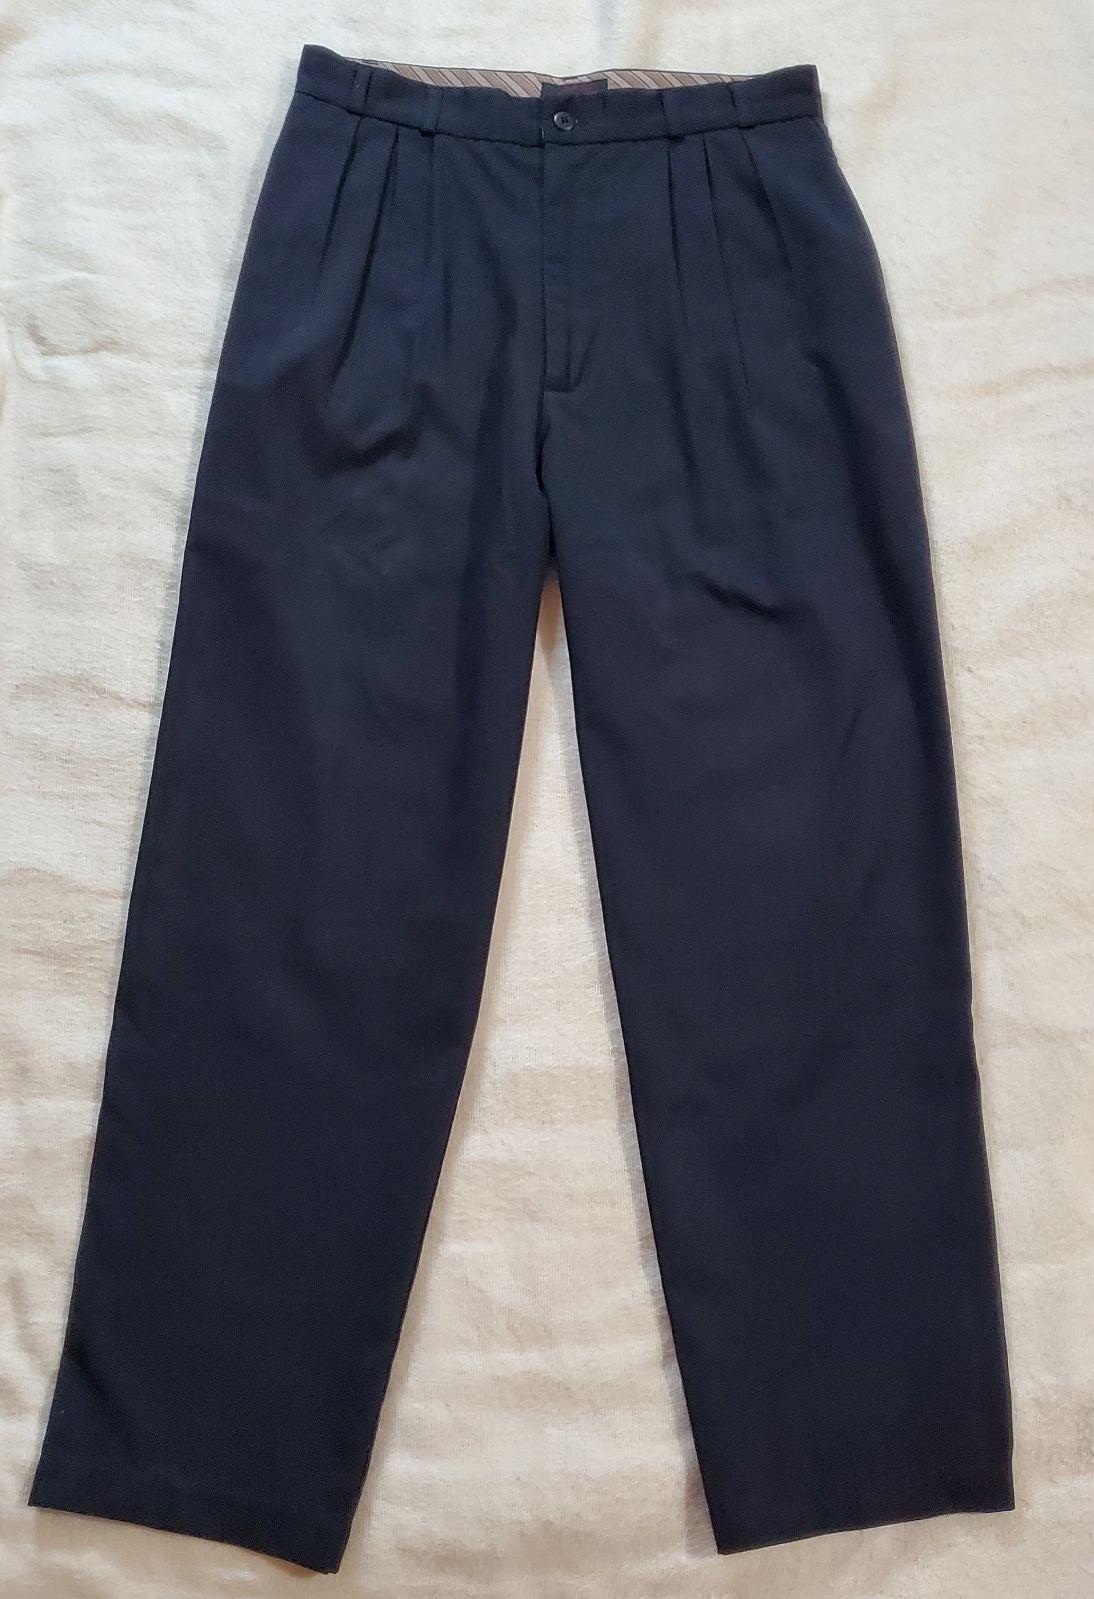 Mens Dress Pants / 30x32